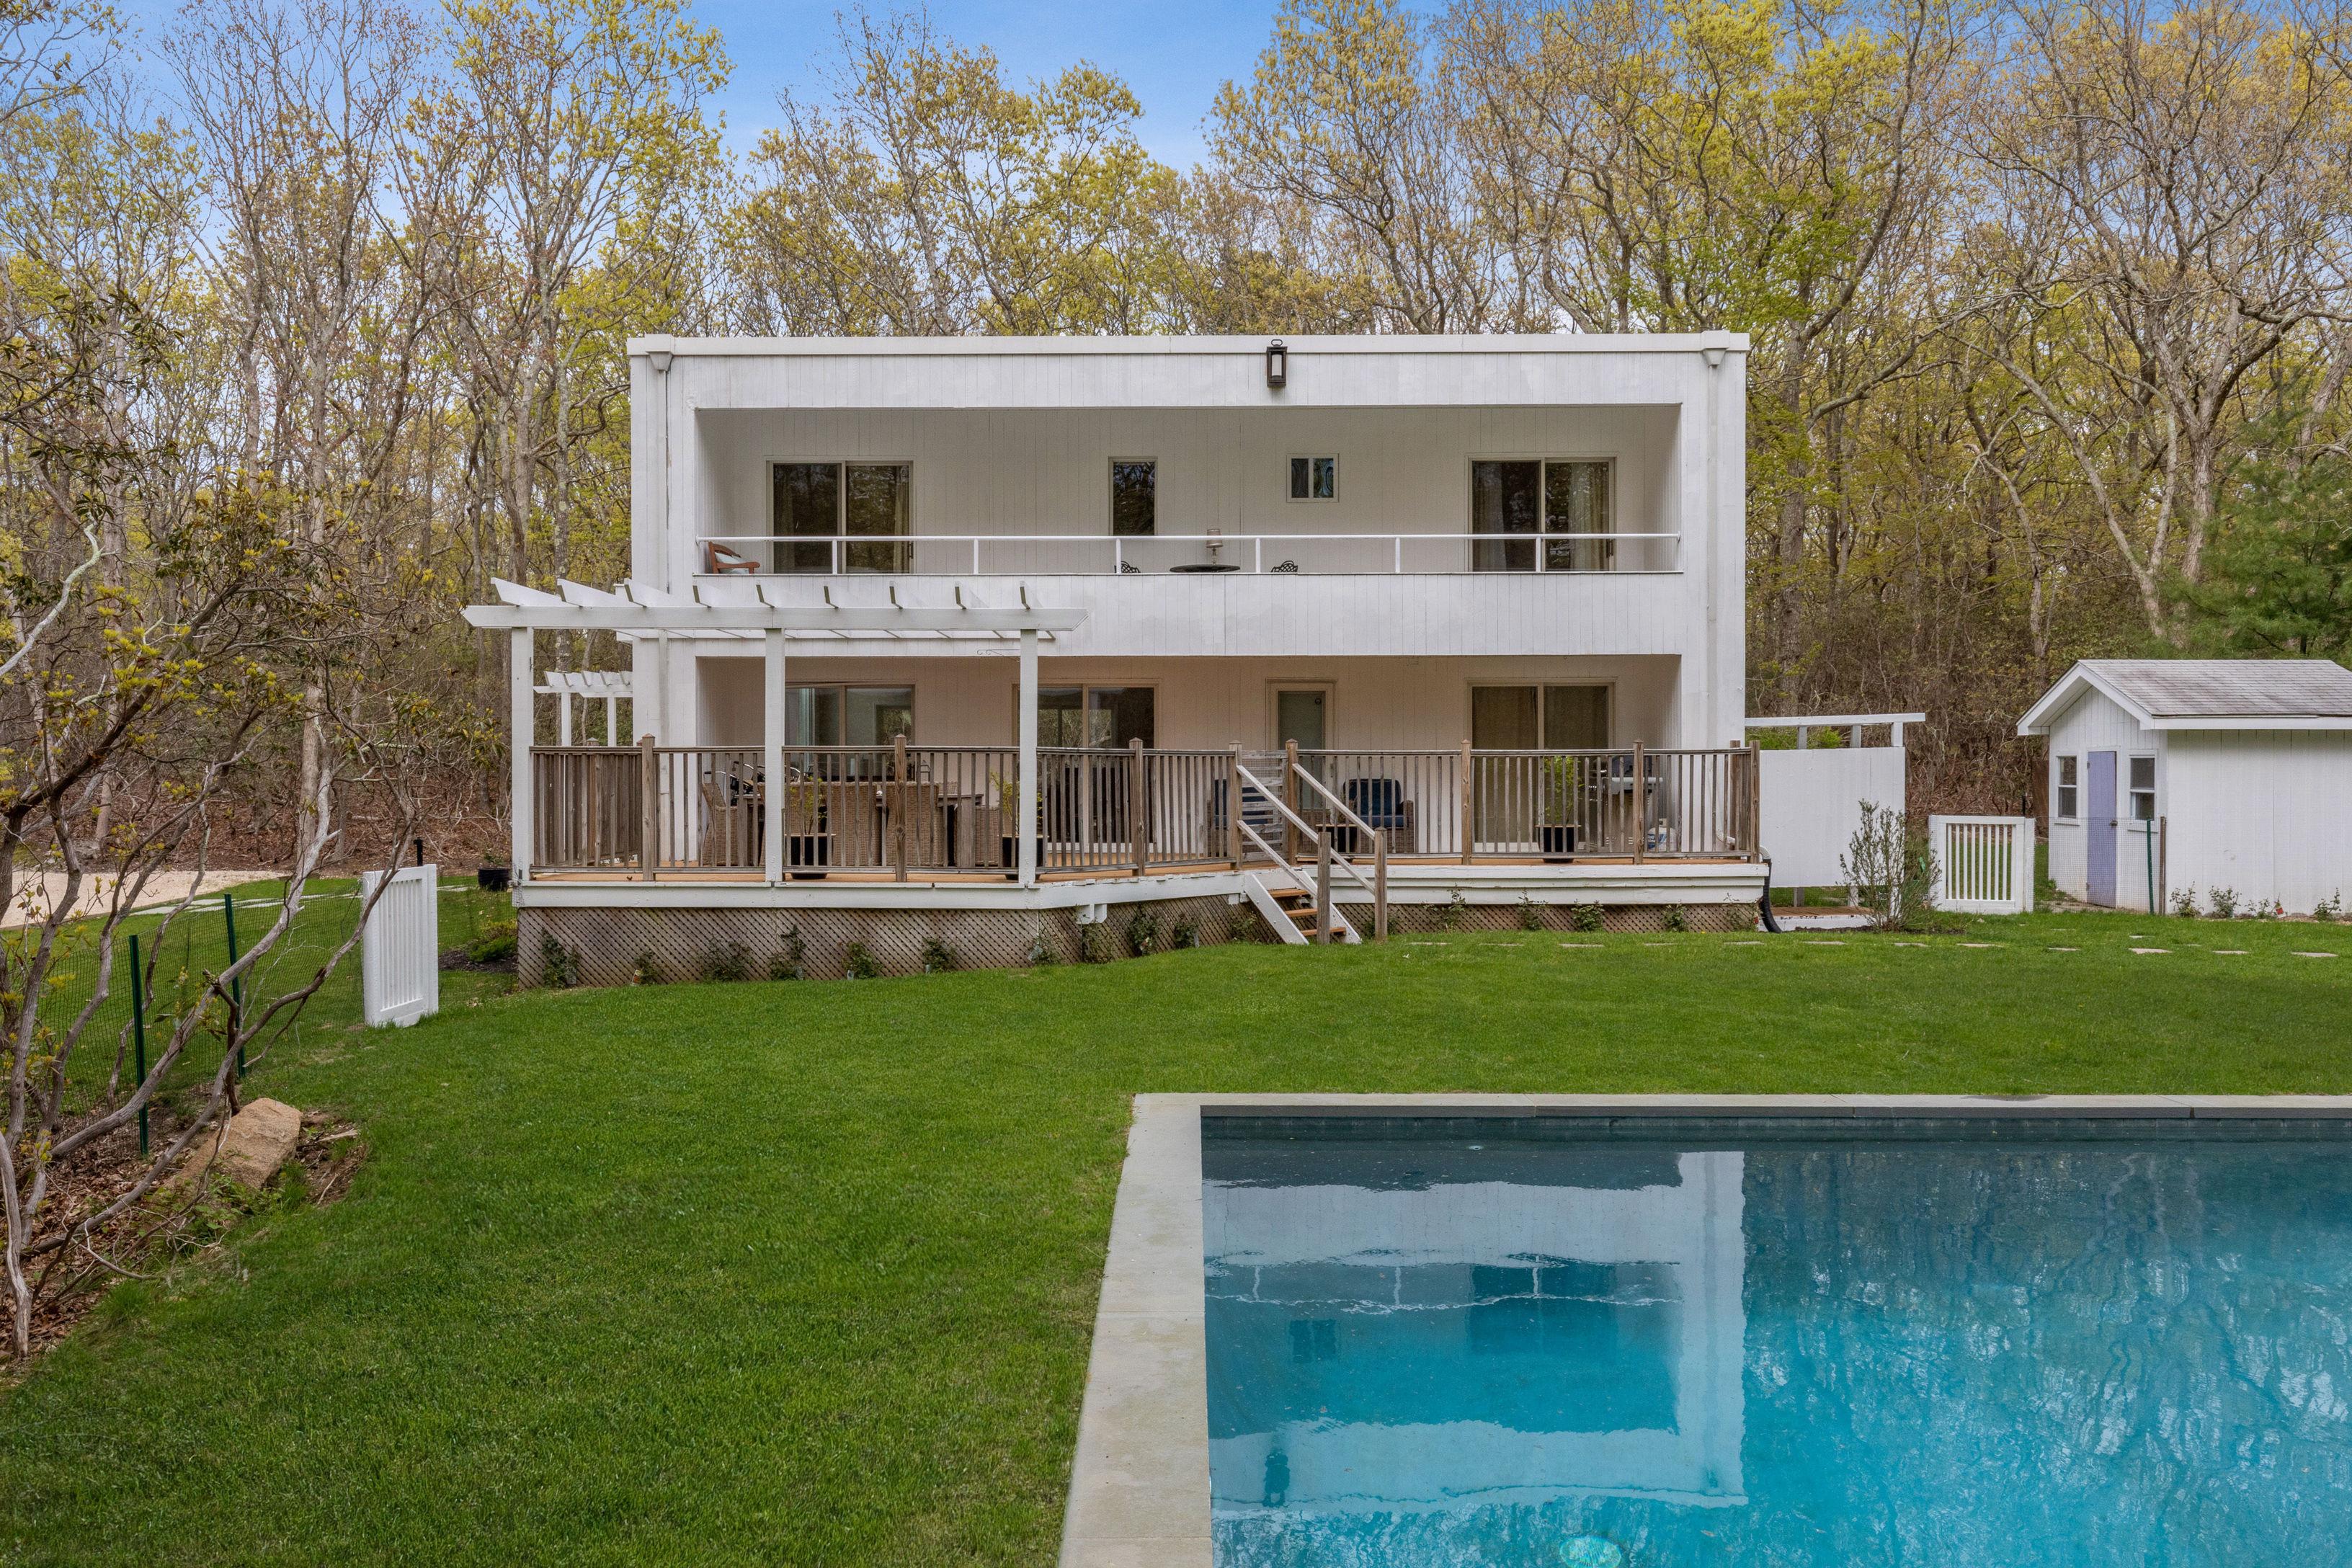 1376 Millstone Rd - Sag Harbor, New York